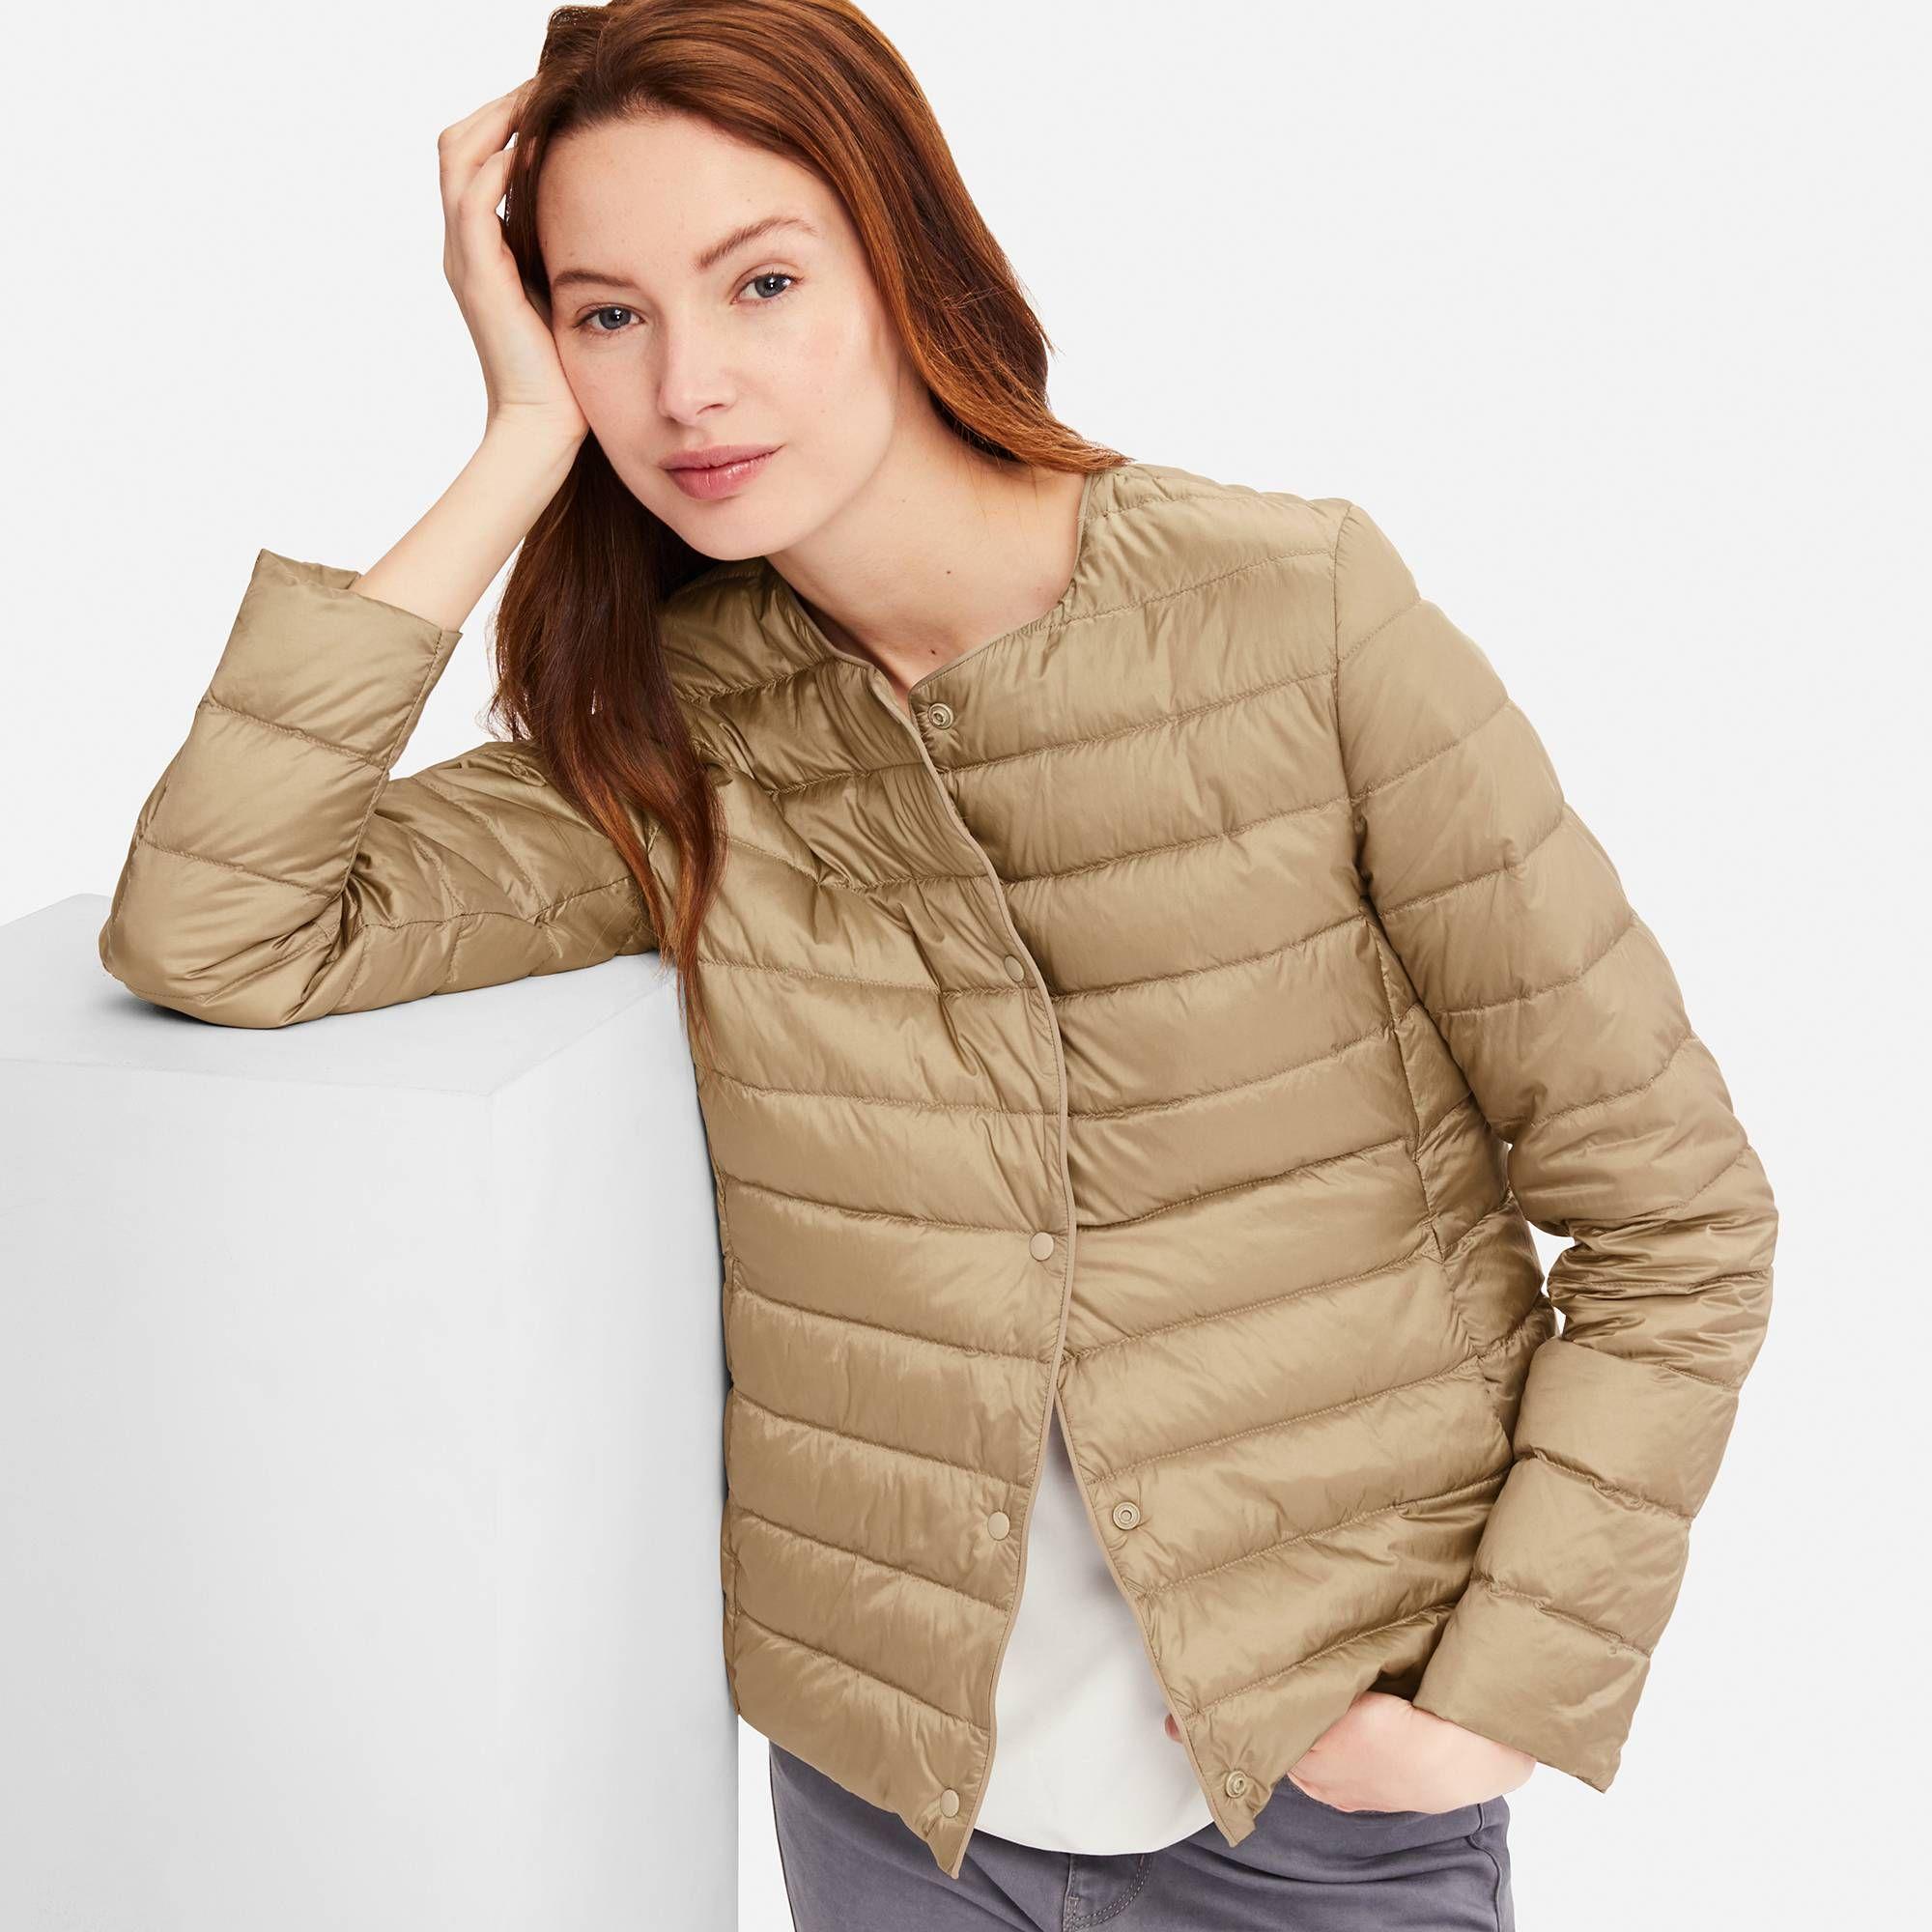 Women Ultra Light Down Compact Jacket Travel Jacket Women Jackets For Women Compact Jacket